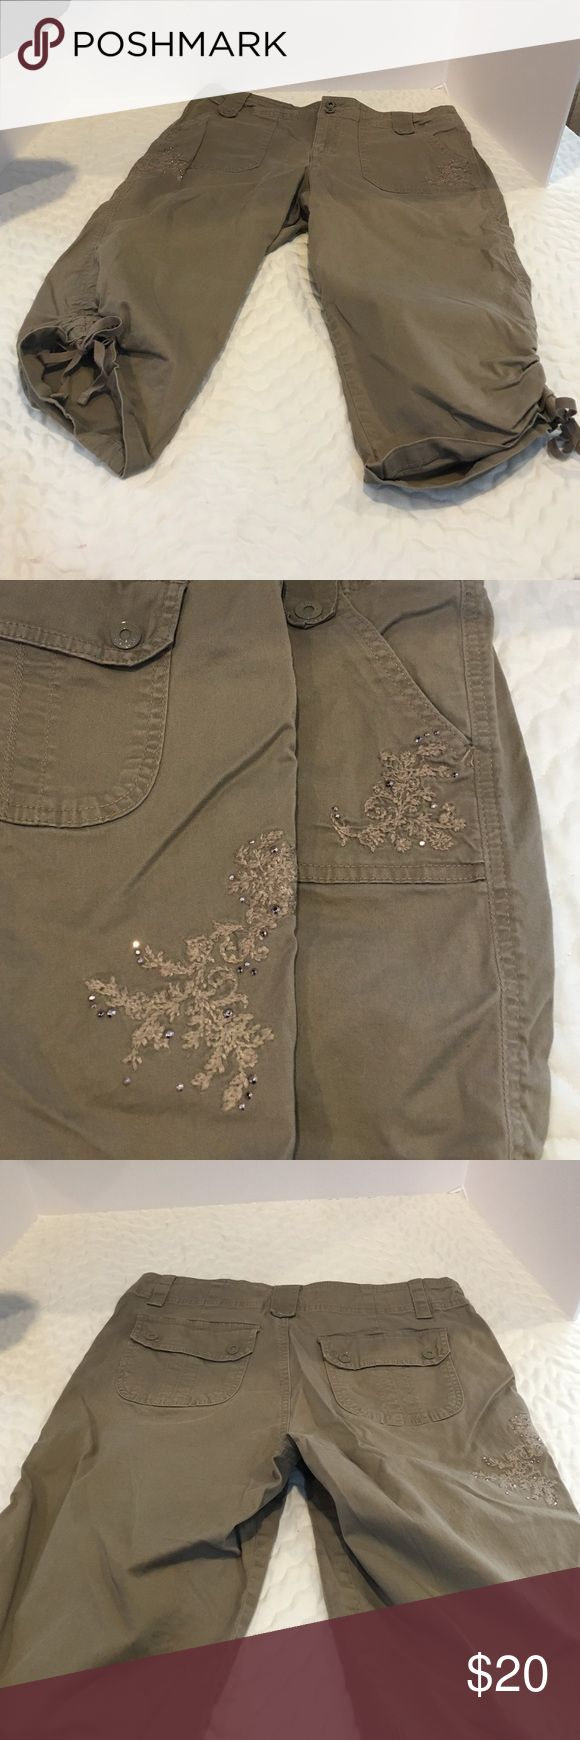 Gloria Vanderbilt khaki capris These capris are gently used. Khaki in color.  Decorative stitching and rhinestones of front and back. Gloria Vanderbilt Pants Capris